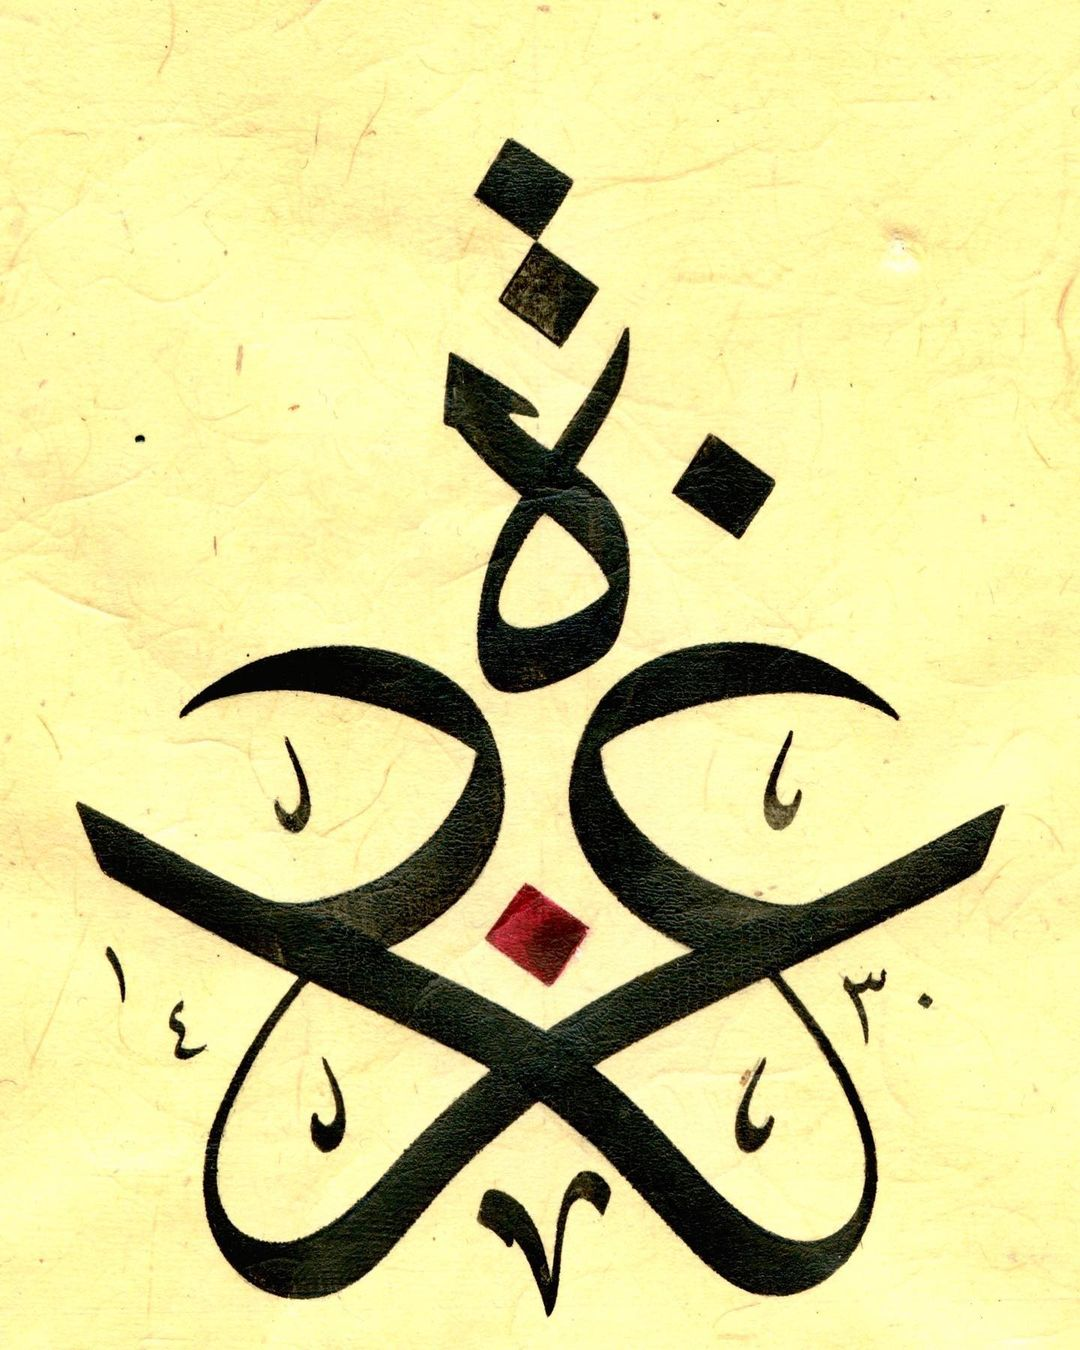 Karya Kaligrafi غَزة .. استشهدت النقطة لتظهر العِزة.. كتبتها قبل ٢٢ سنة اثناء تعدي الاوغاد الاس...- jasssim Meraj 1